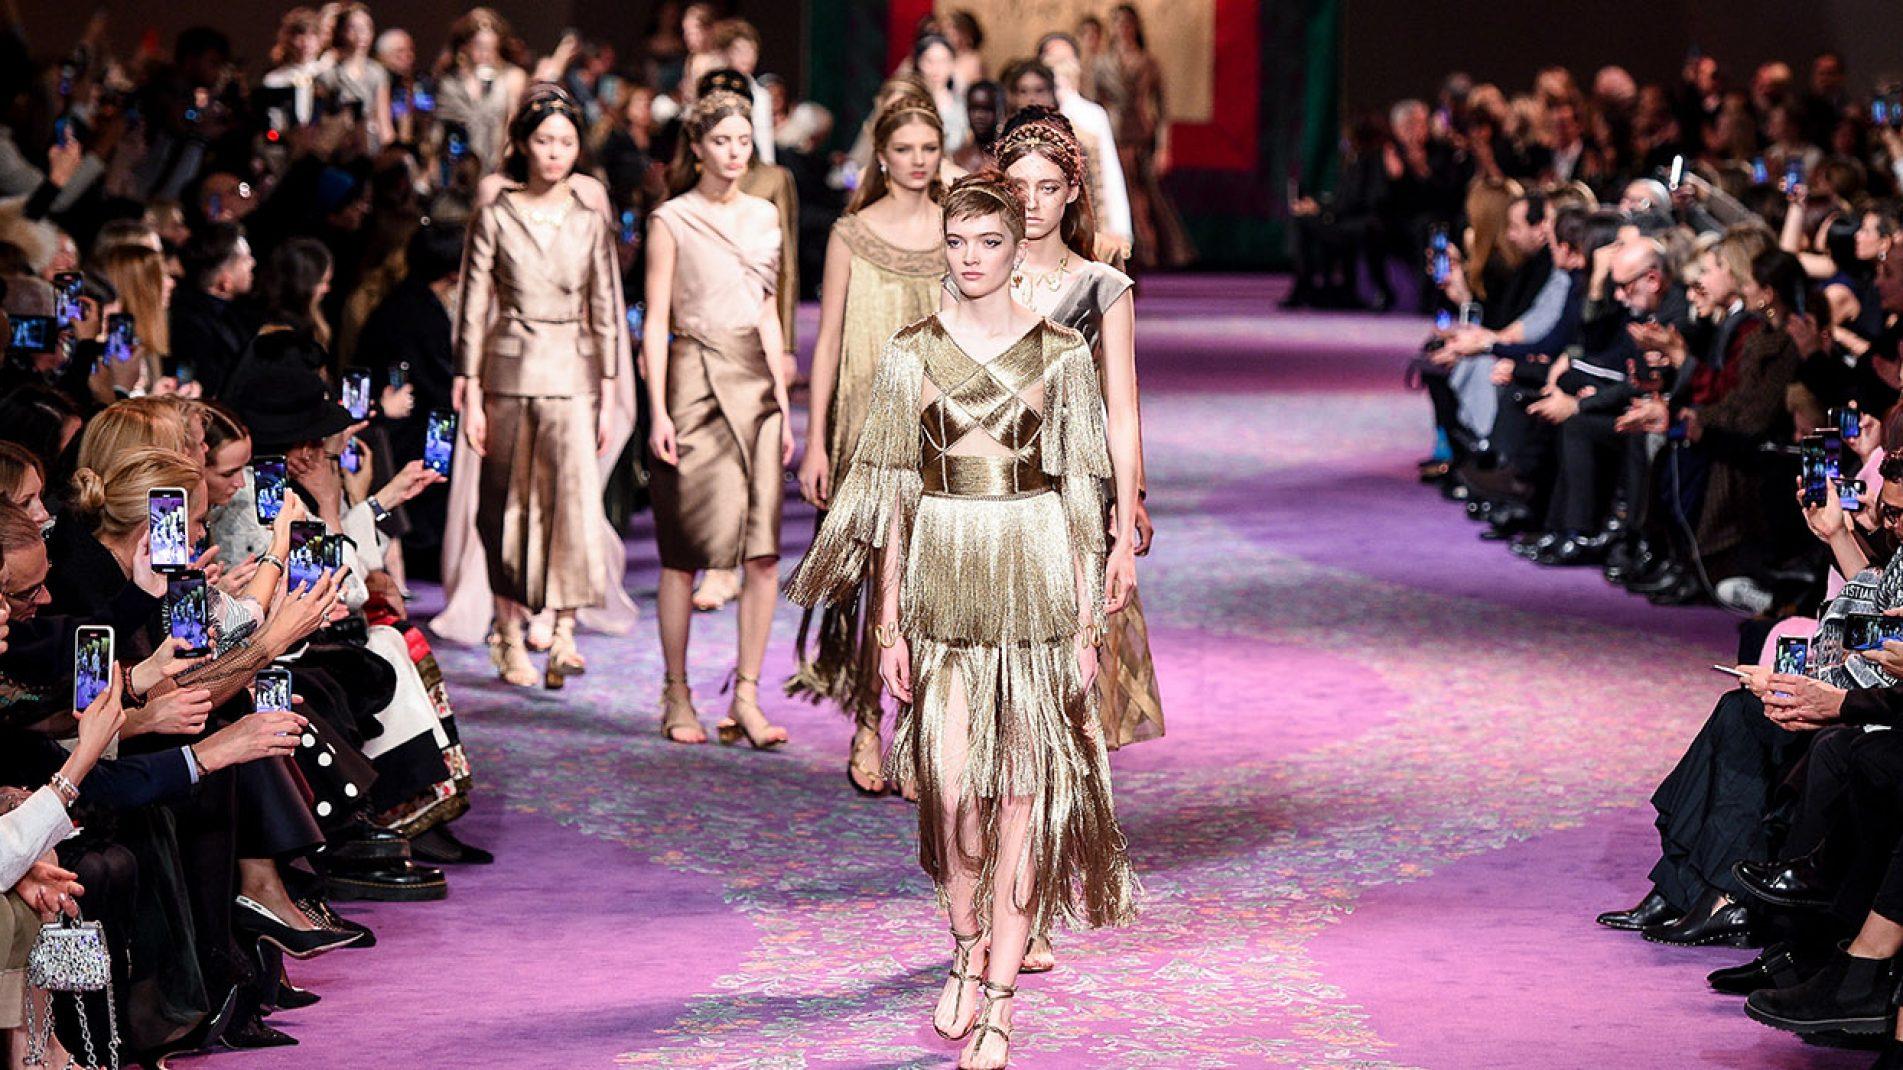 pixelformula | Haute Couture Fashion Week 2020 Paris, house of Christian Dior